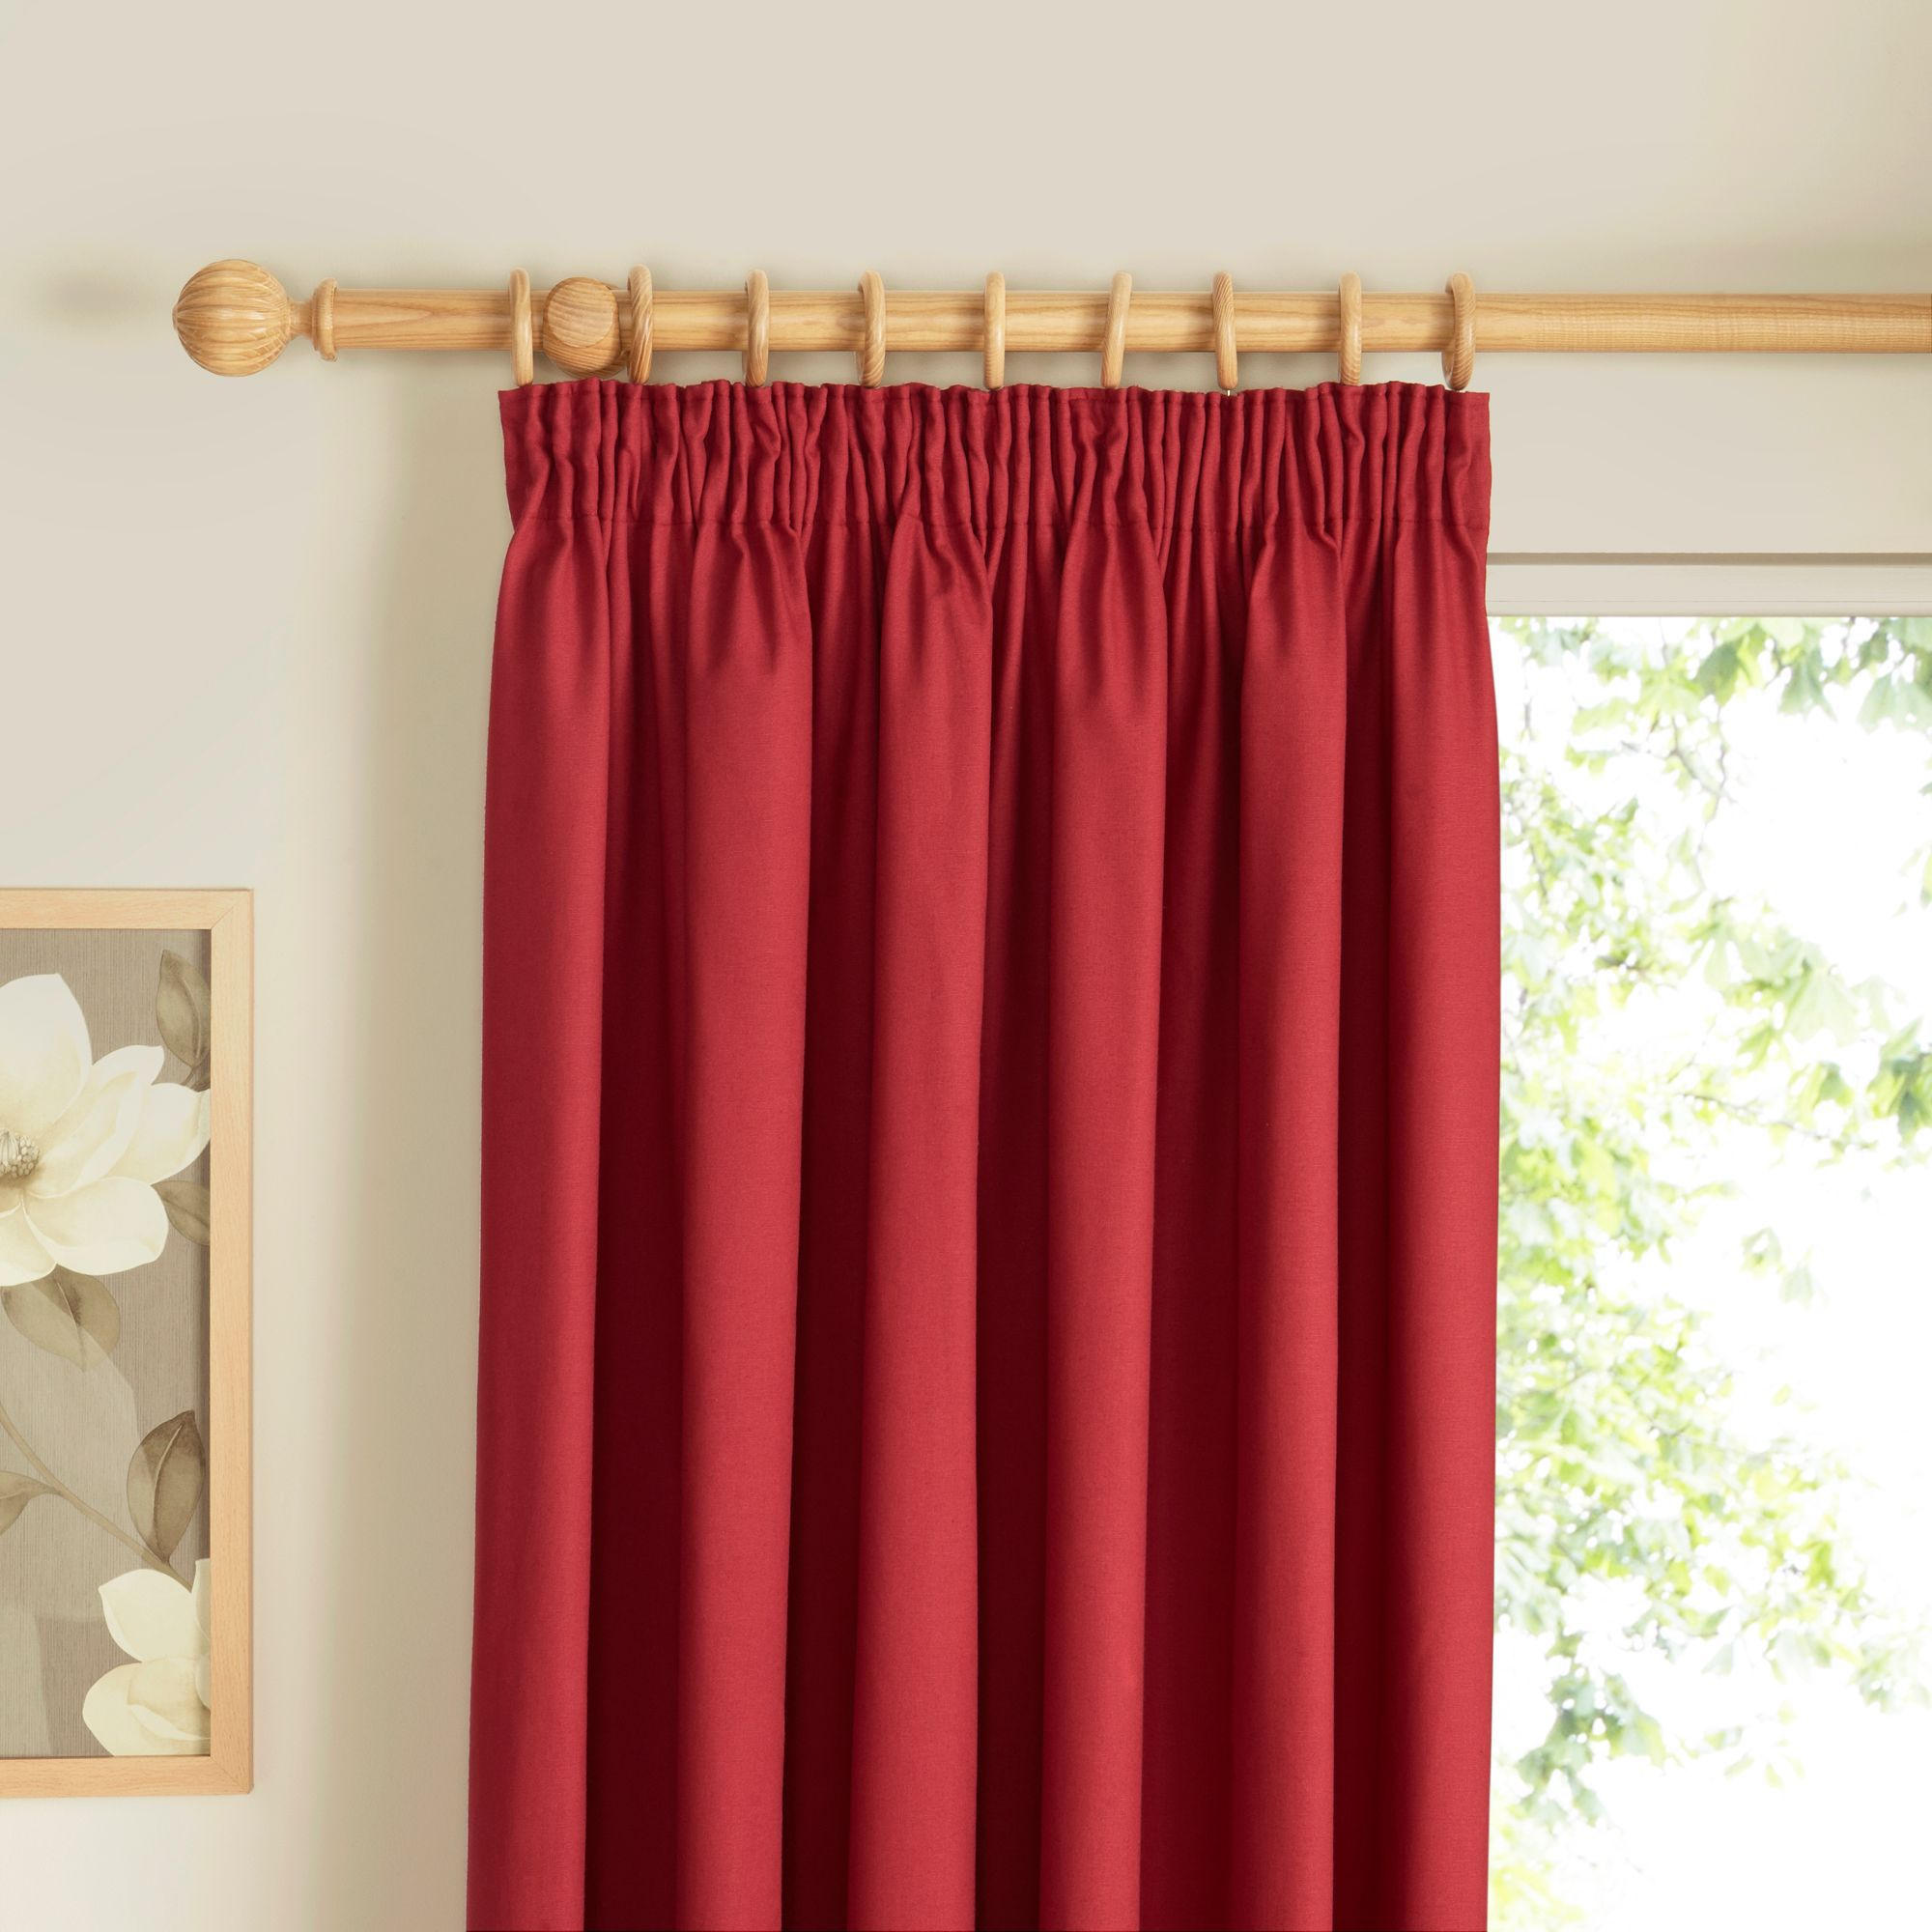 Strawberry Kitchen Curtains Prestige Strawberry Plain Pencil Pleat Lined Curtains W167cm L